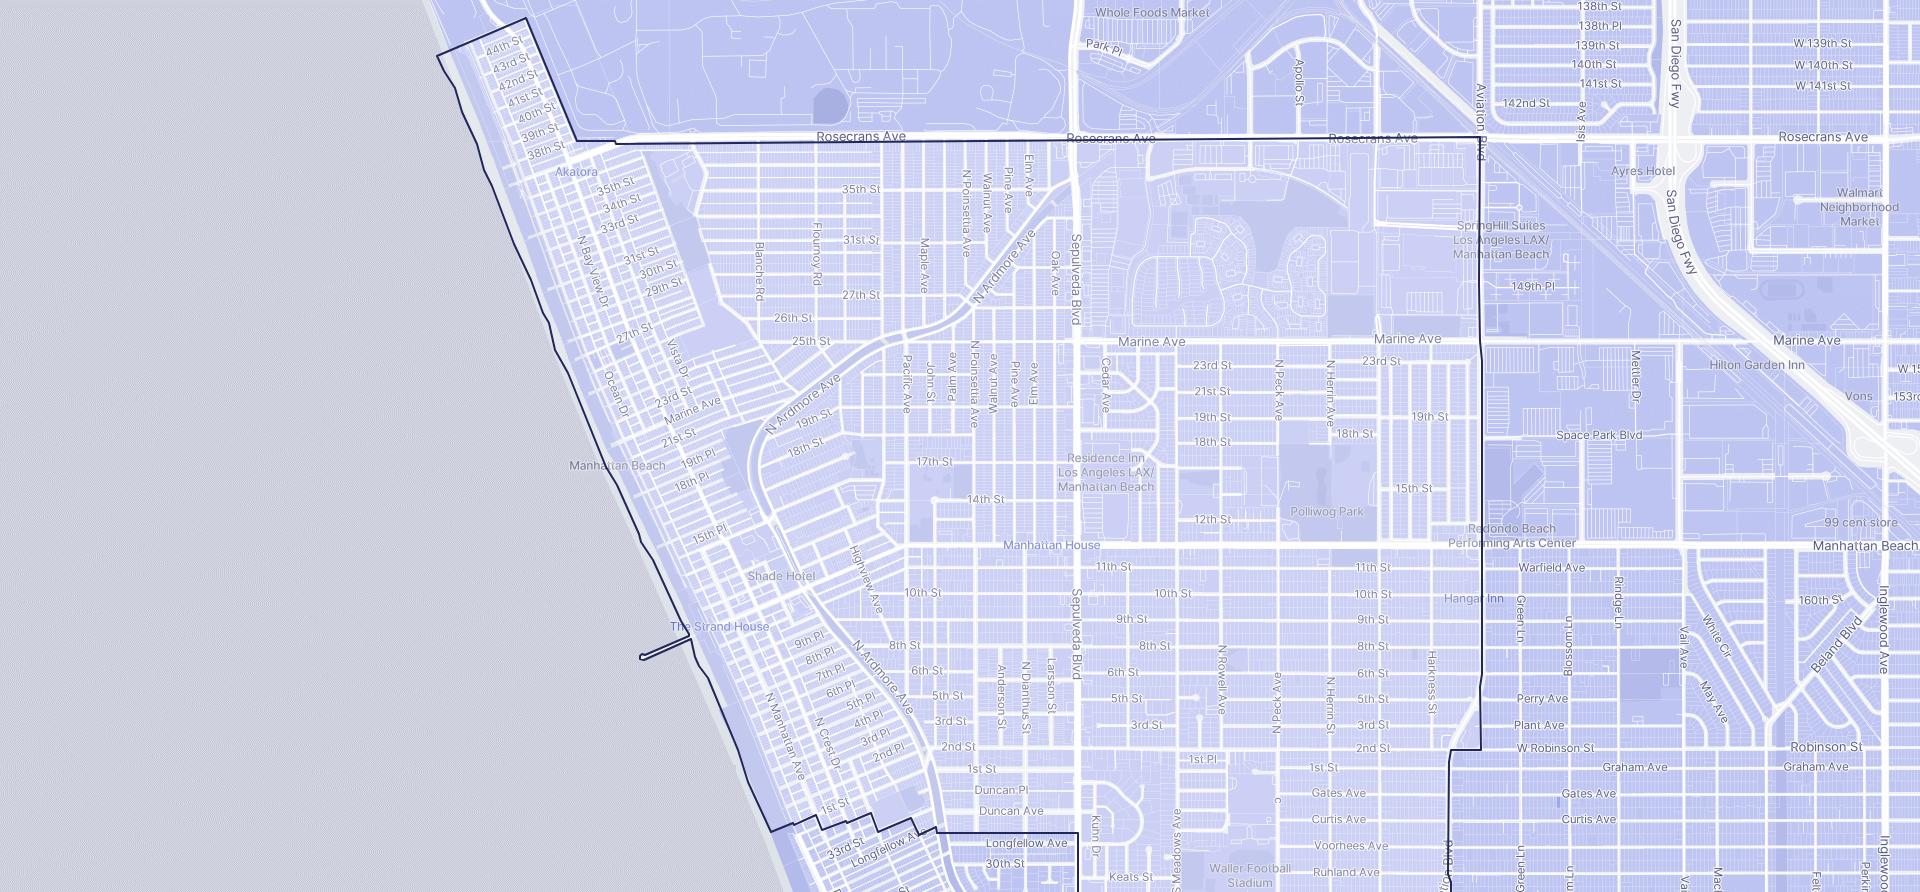 Image of Manhattan Beach boundaries on a map.